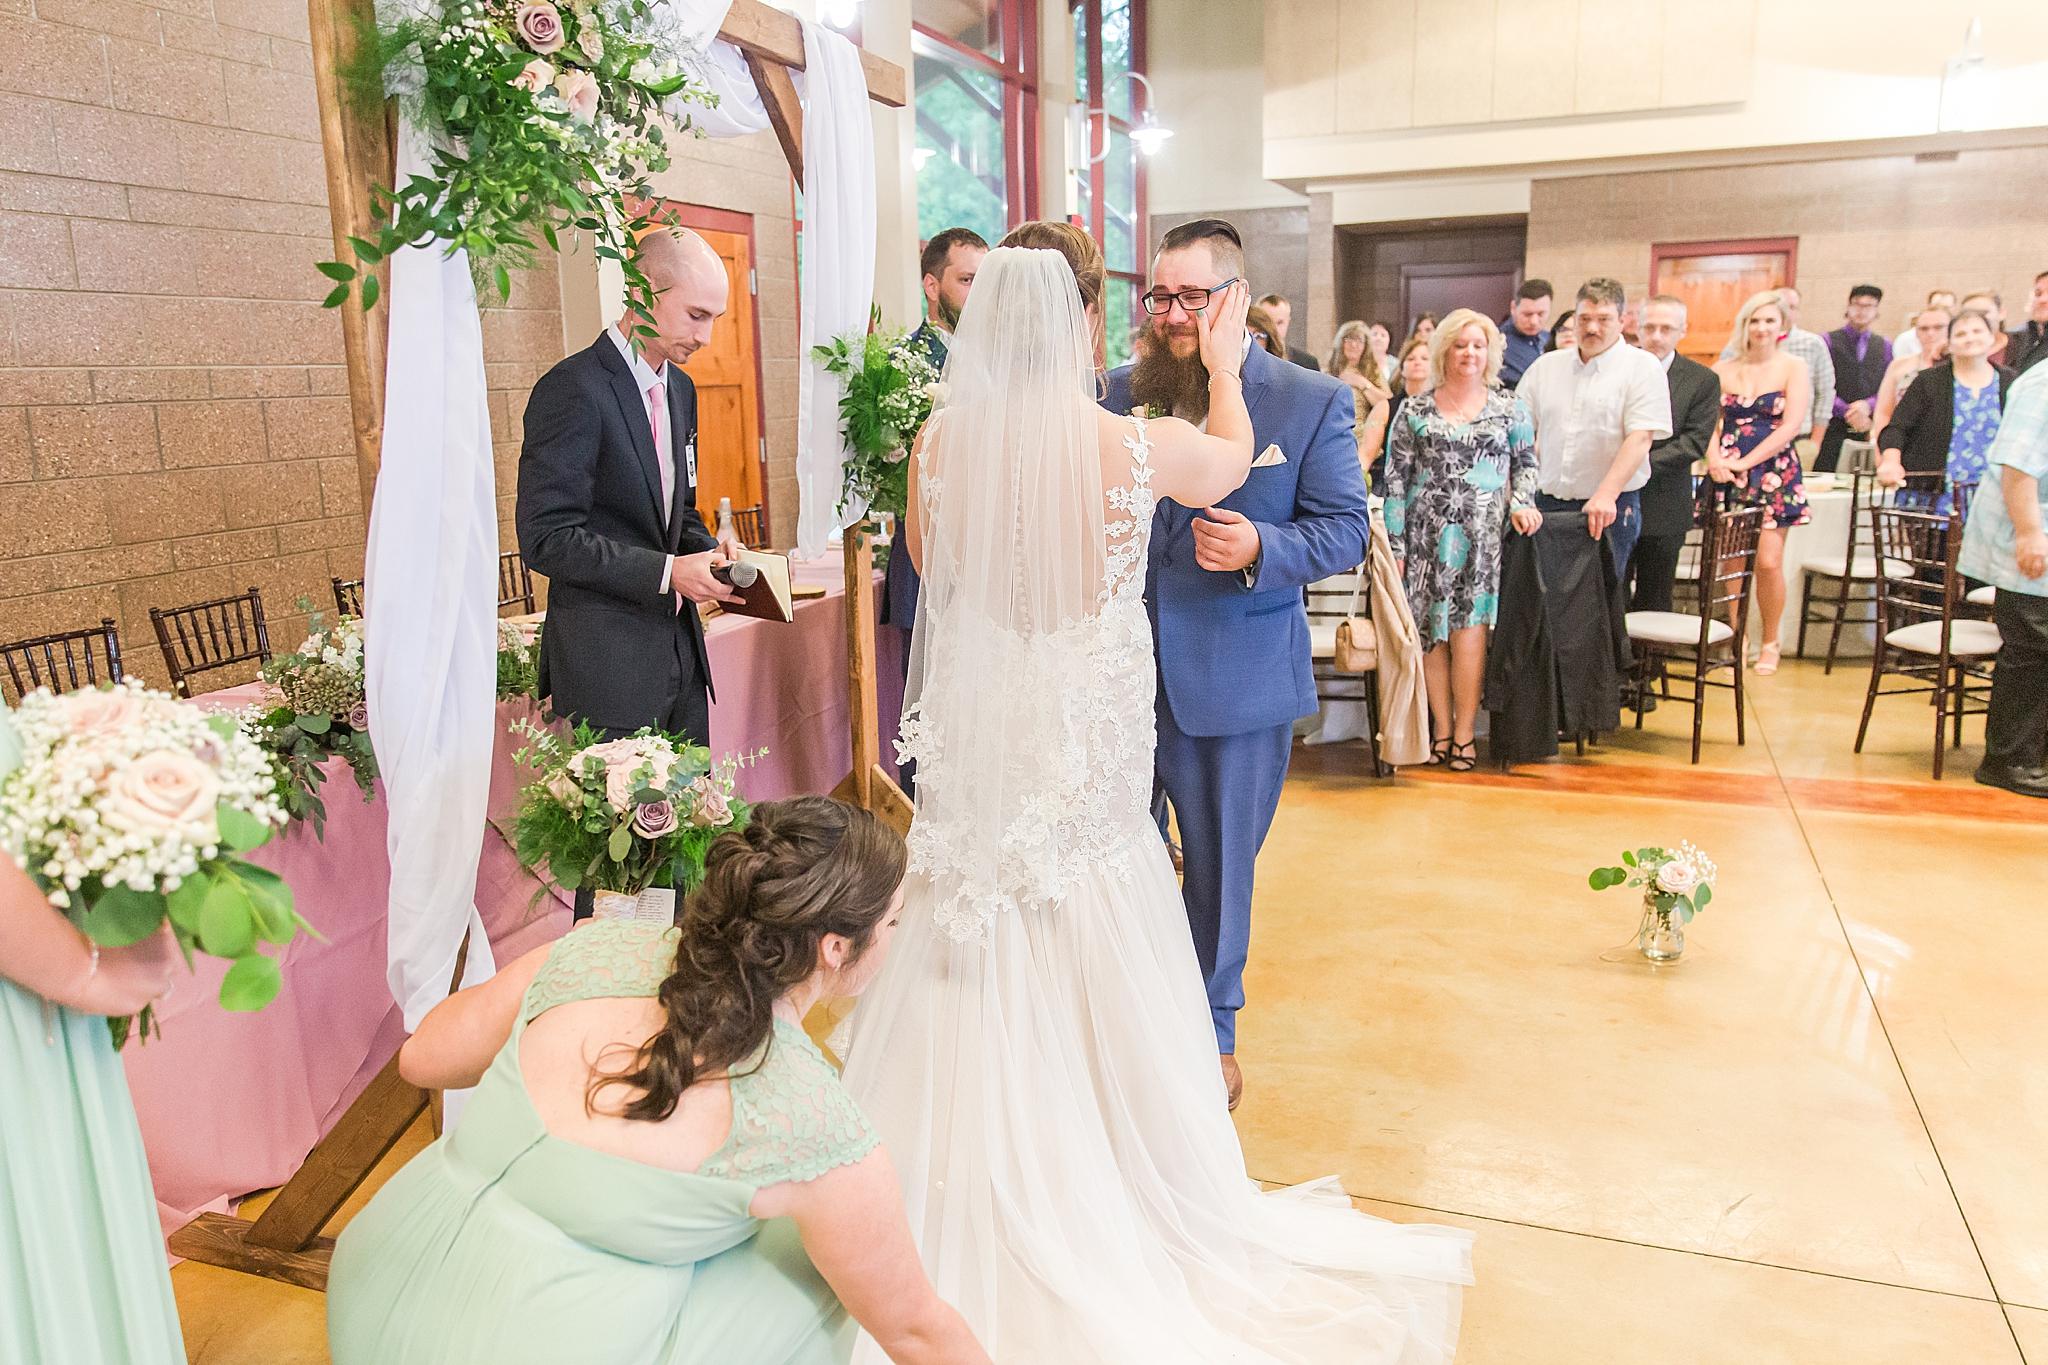 detroit-wedding-photographer-brownstown-event-center-wedding-photos-sam-josh-by-courtney-carolyn-photography_0035.jpg